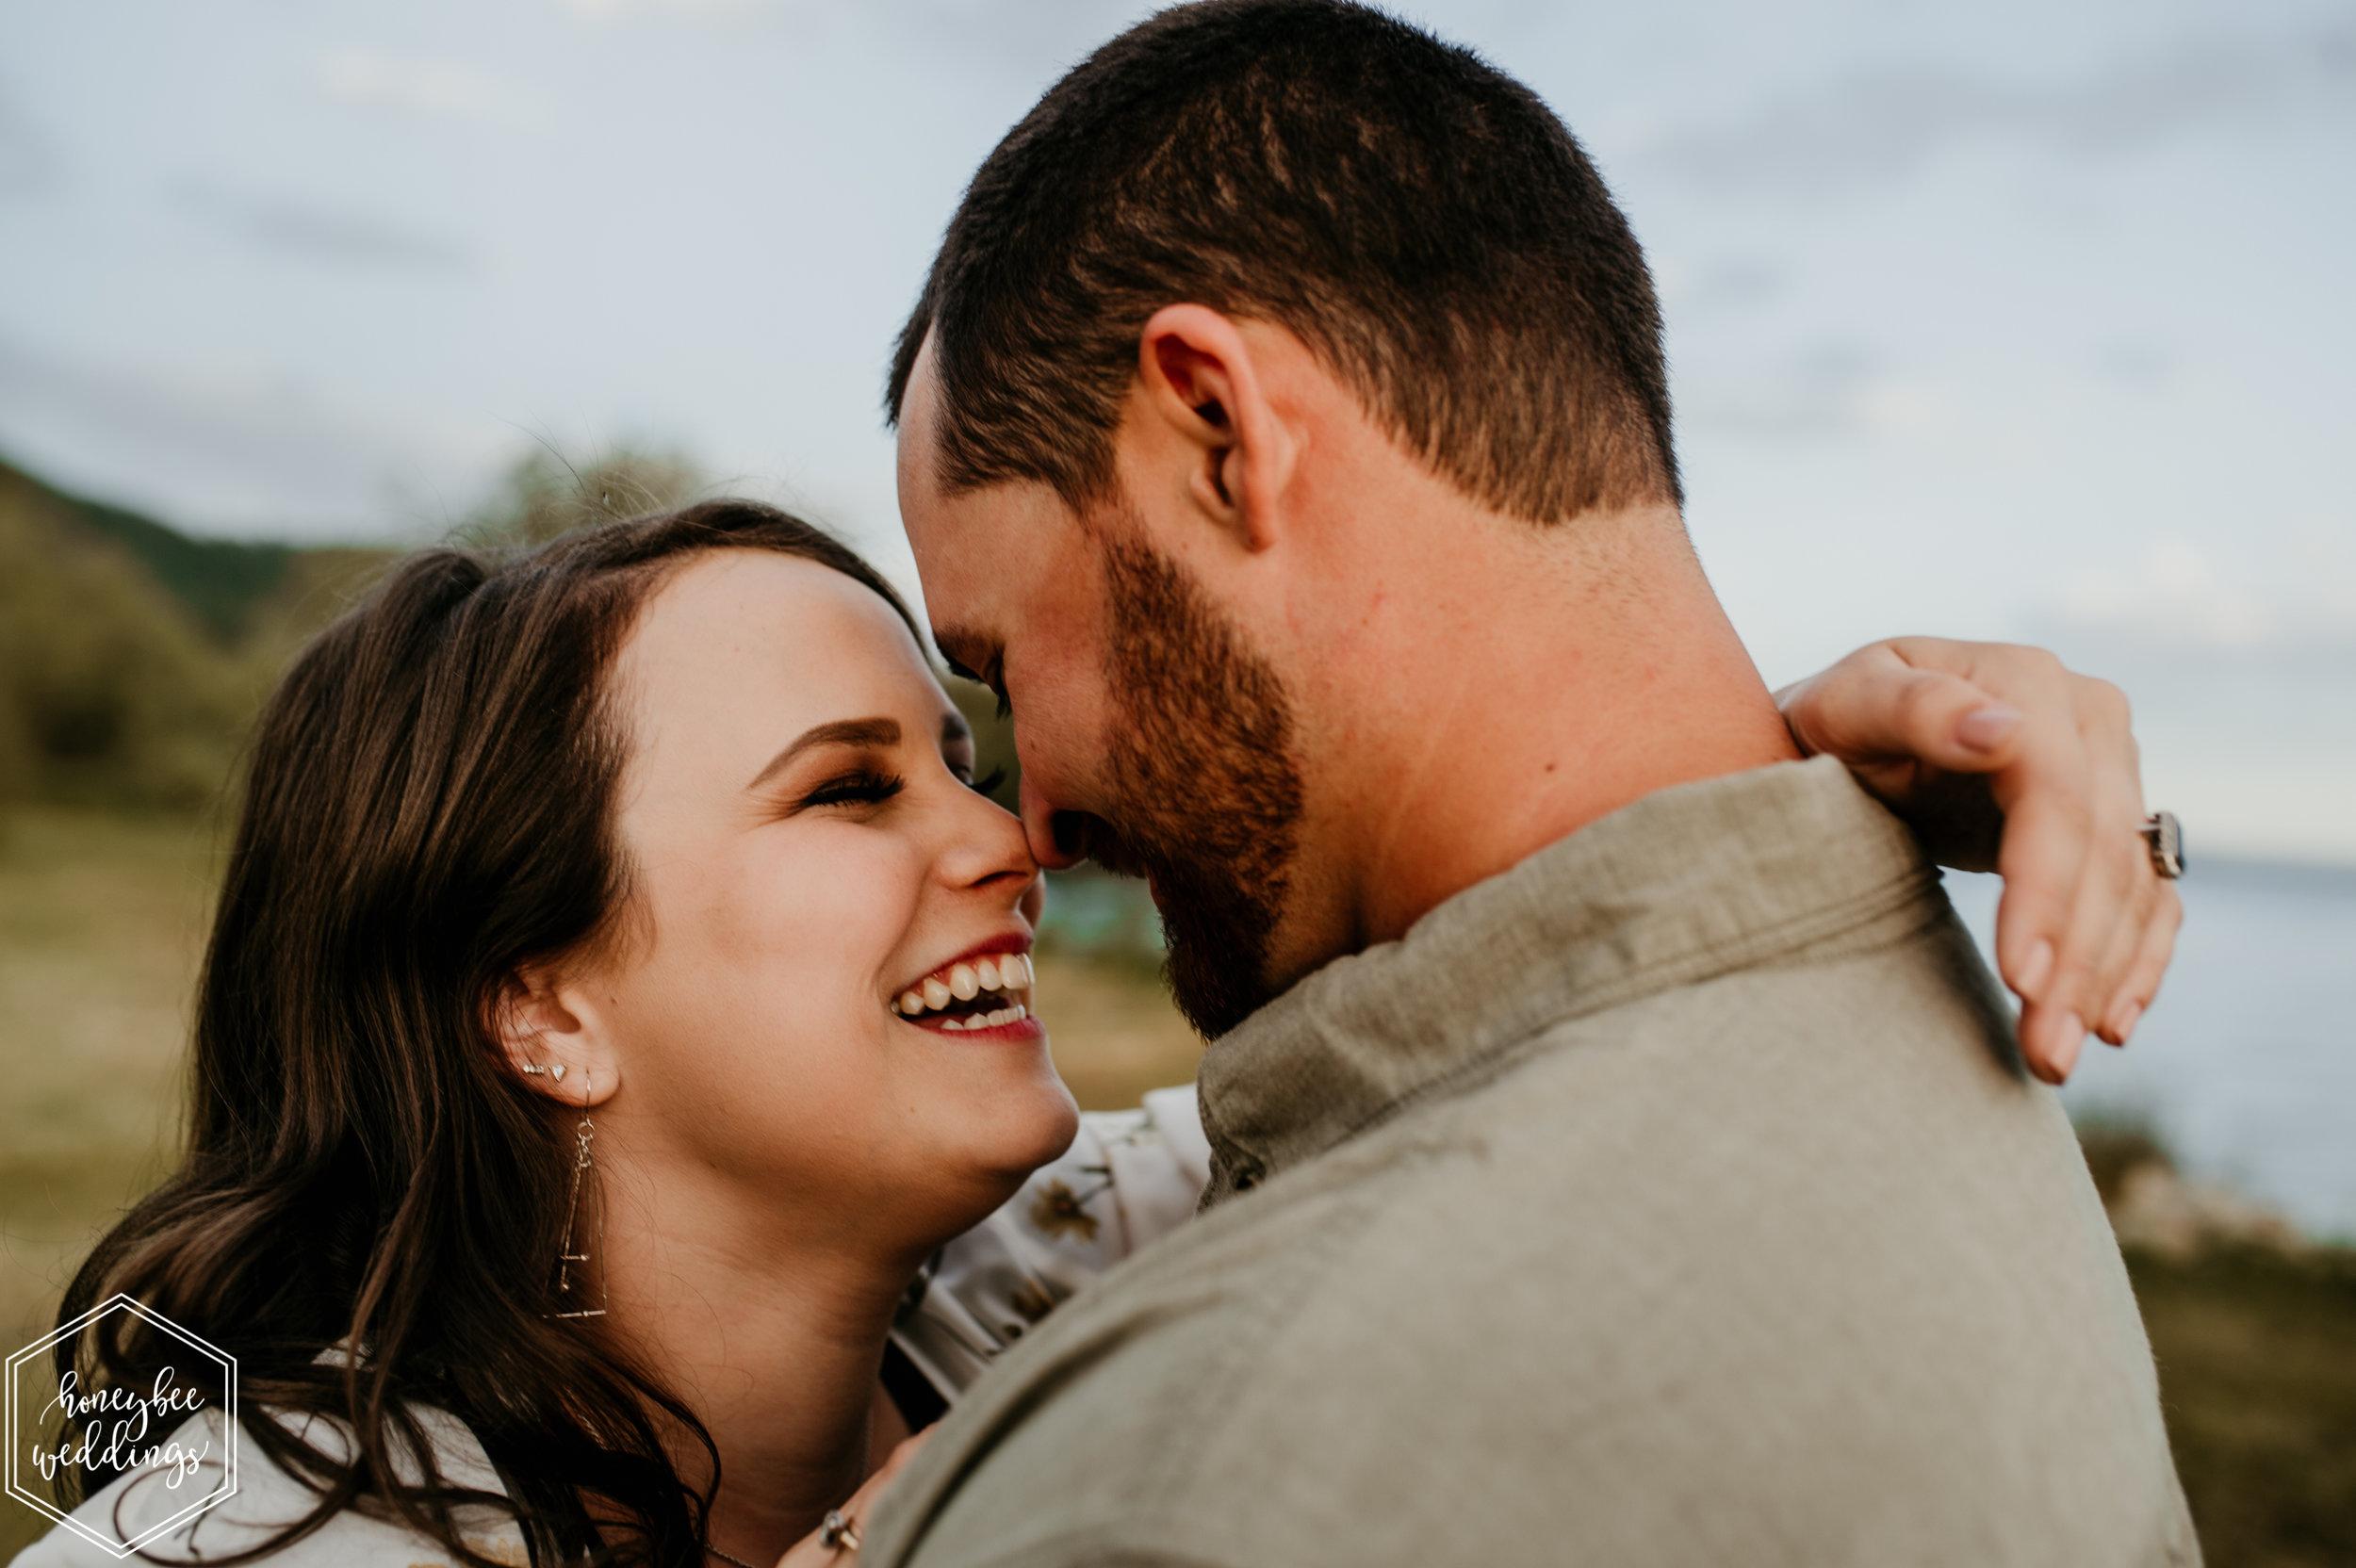 052Yellowstone National Park Wedding Photographer_Montana Engagement Session_Kelsie & DJ_July 24, 2019-521.jpg